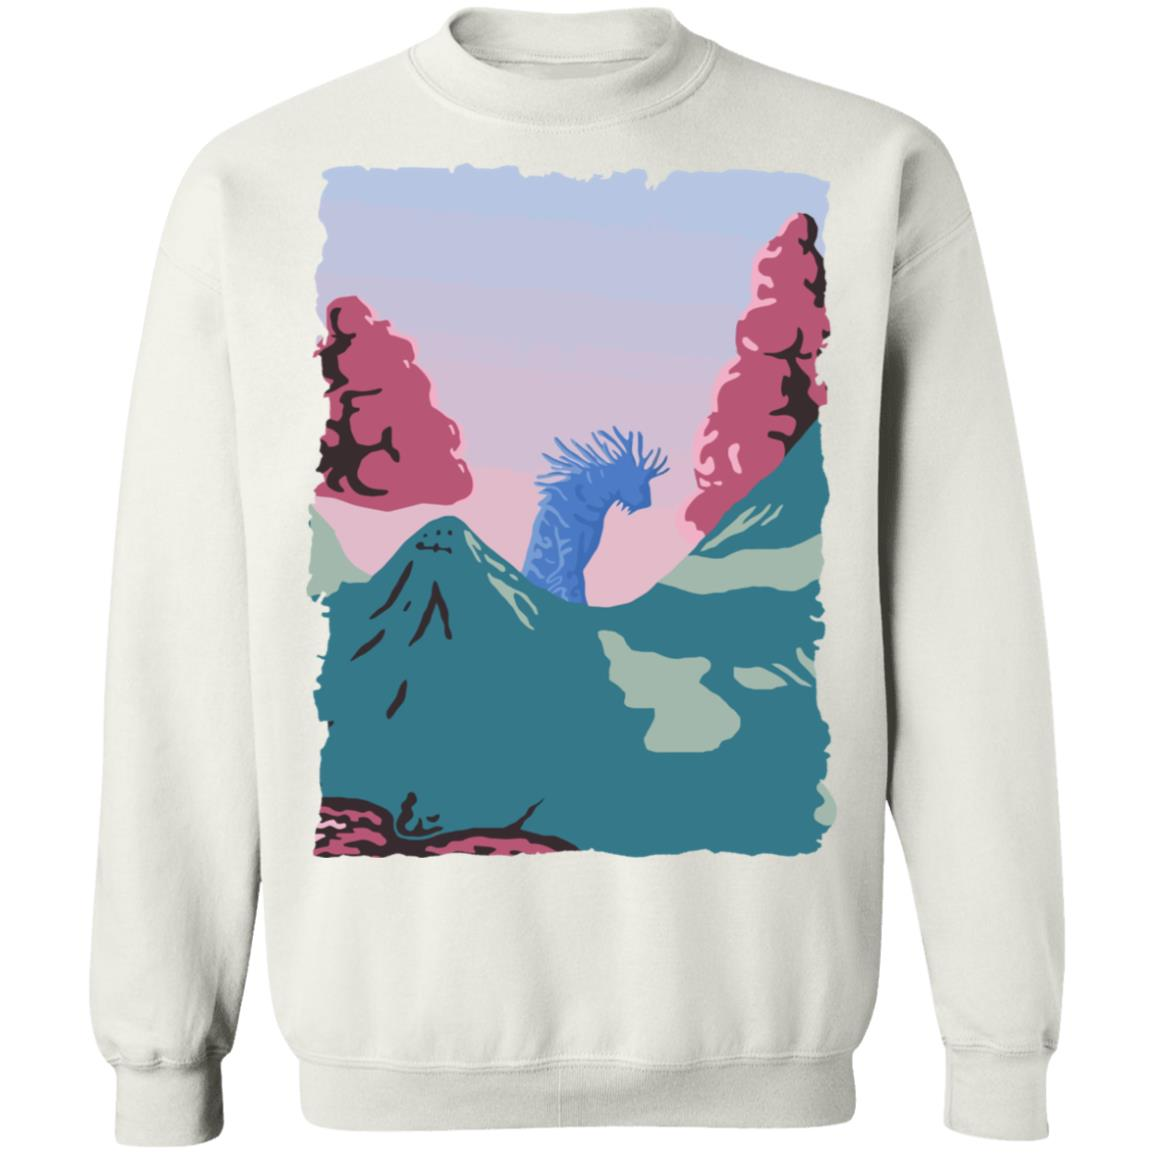 Princess Mononoke – Shishigami Night time Sweatshirt Unisex